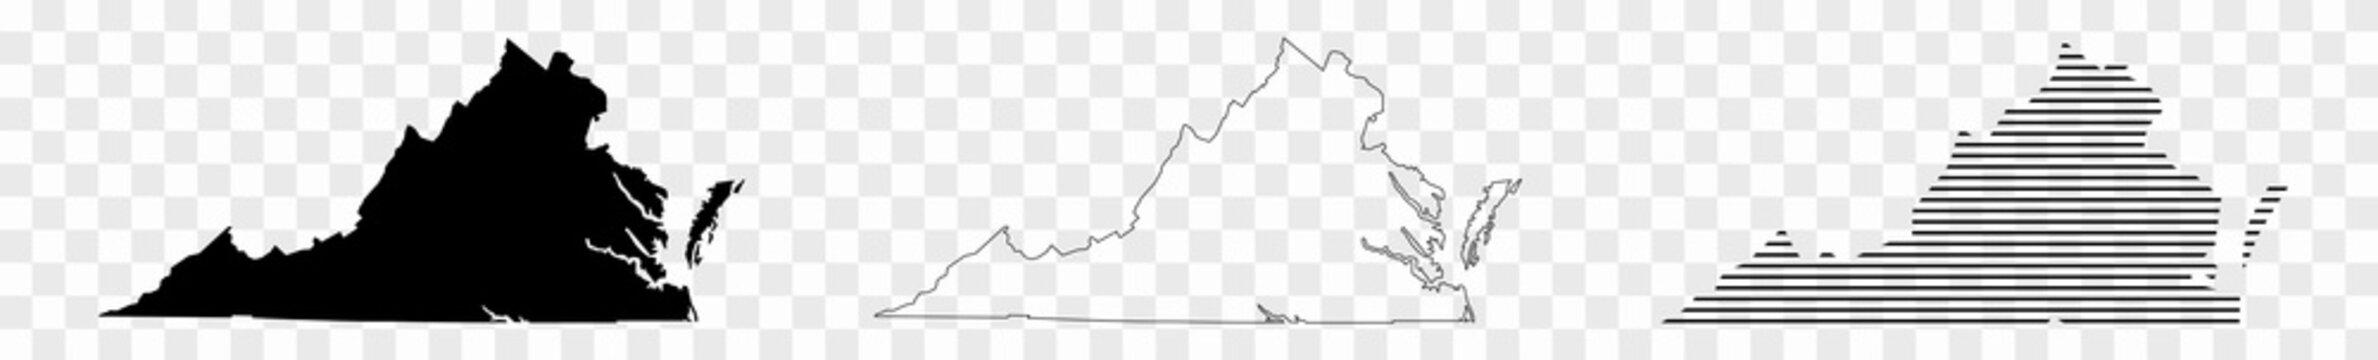 Virginia Map Black   State Border   United States   US America   Transparent Isolated   Variations